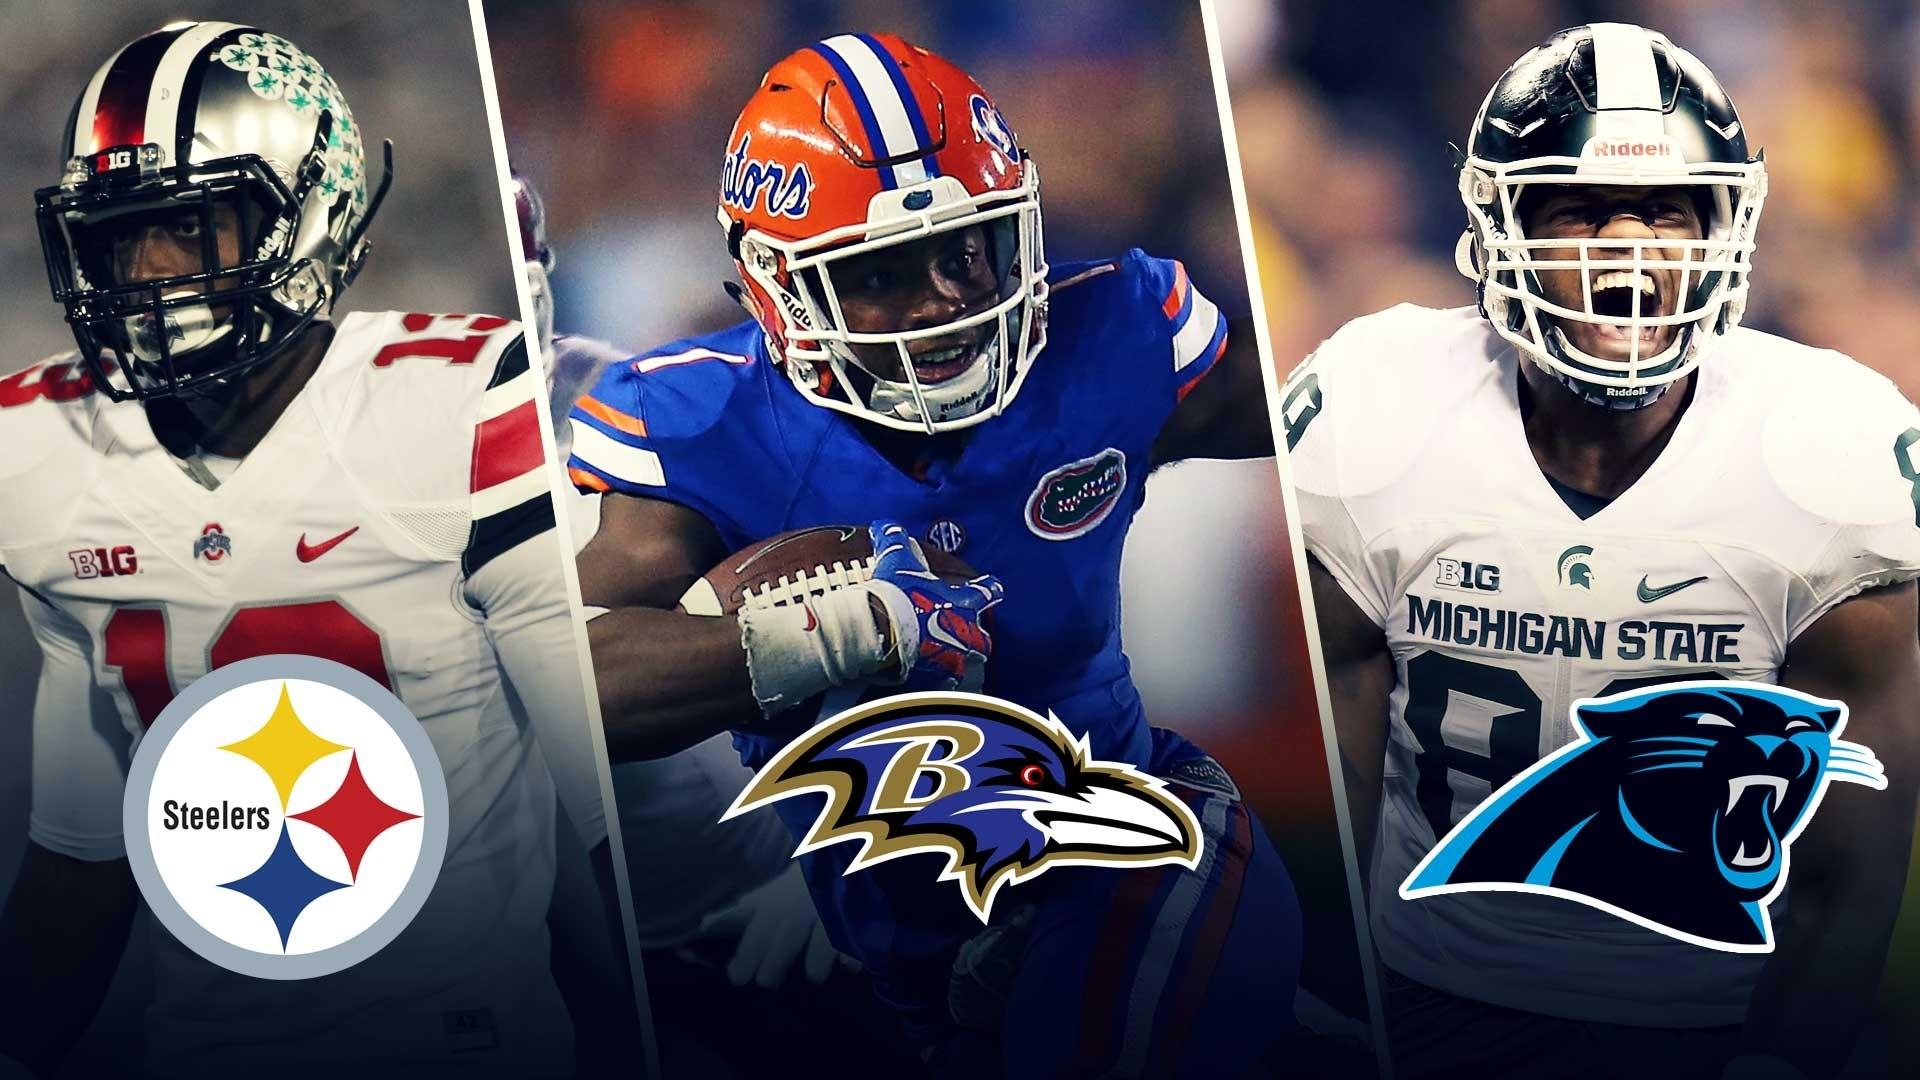 Best NFL Team Wallpapers Football Wallpapers